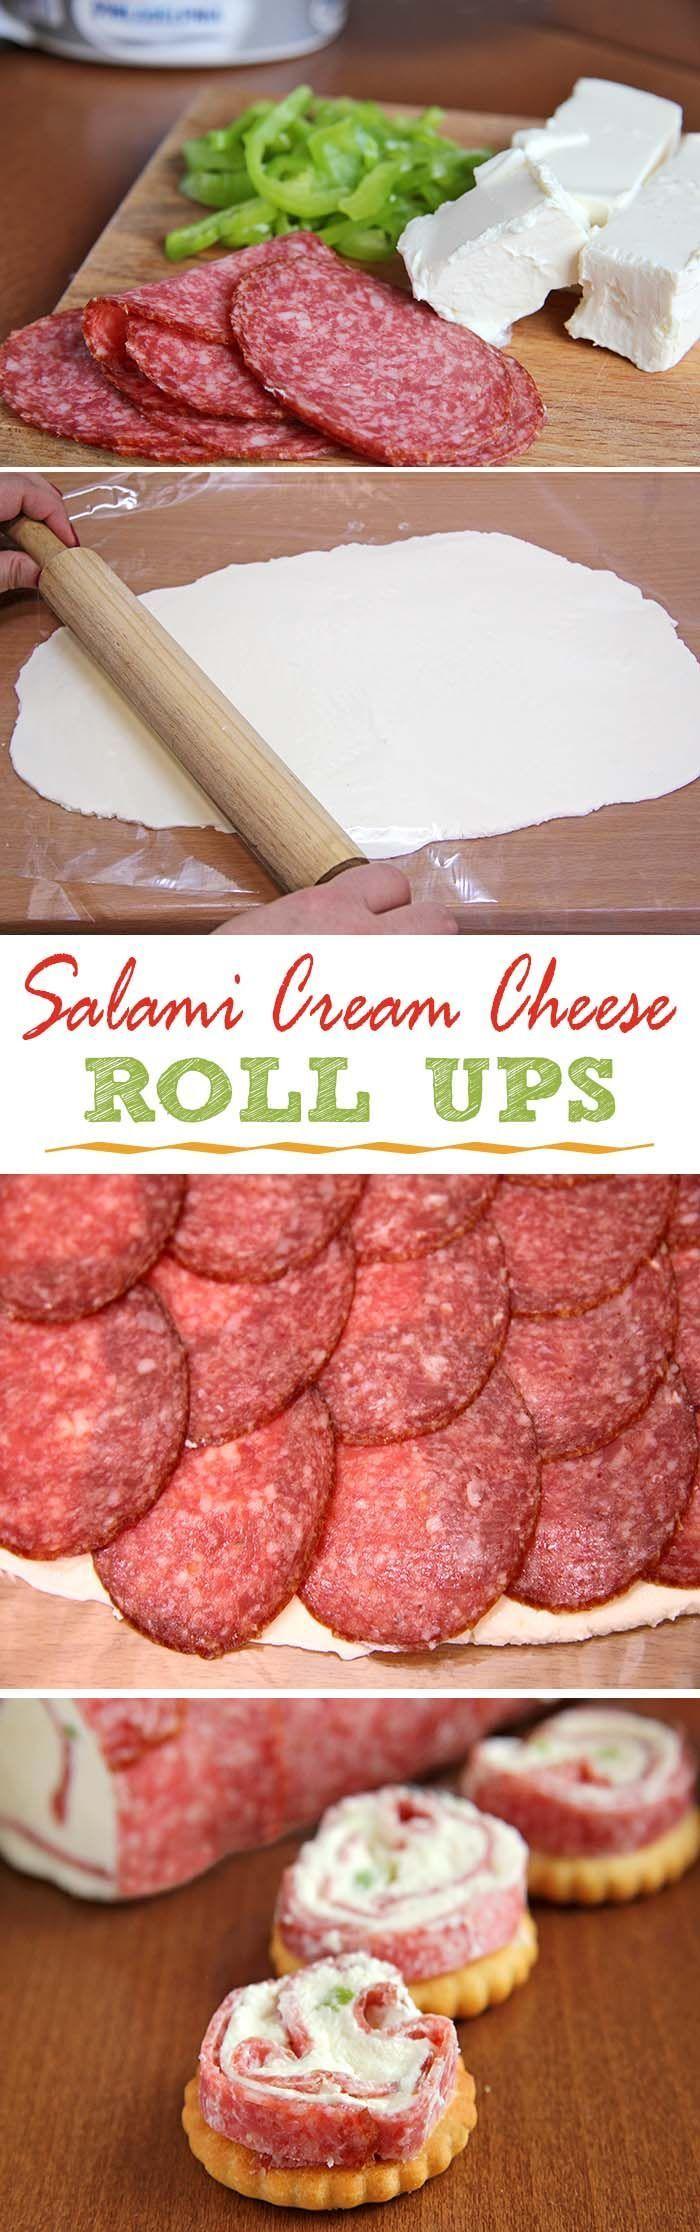 Salami & Cream Cheese Roll-Ups Five Little Chefs